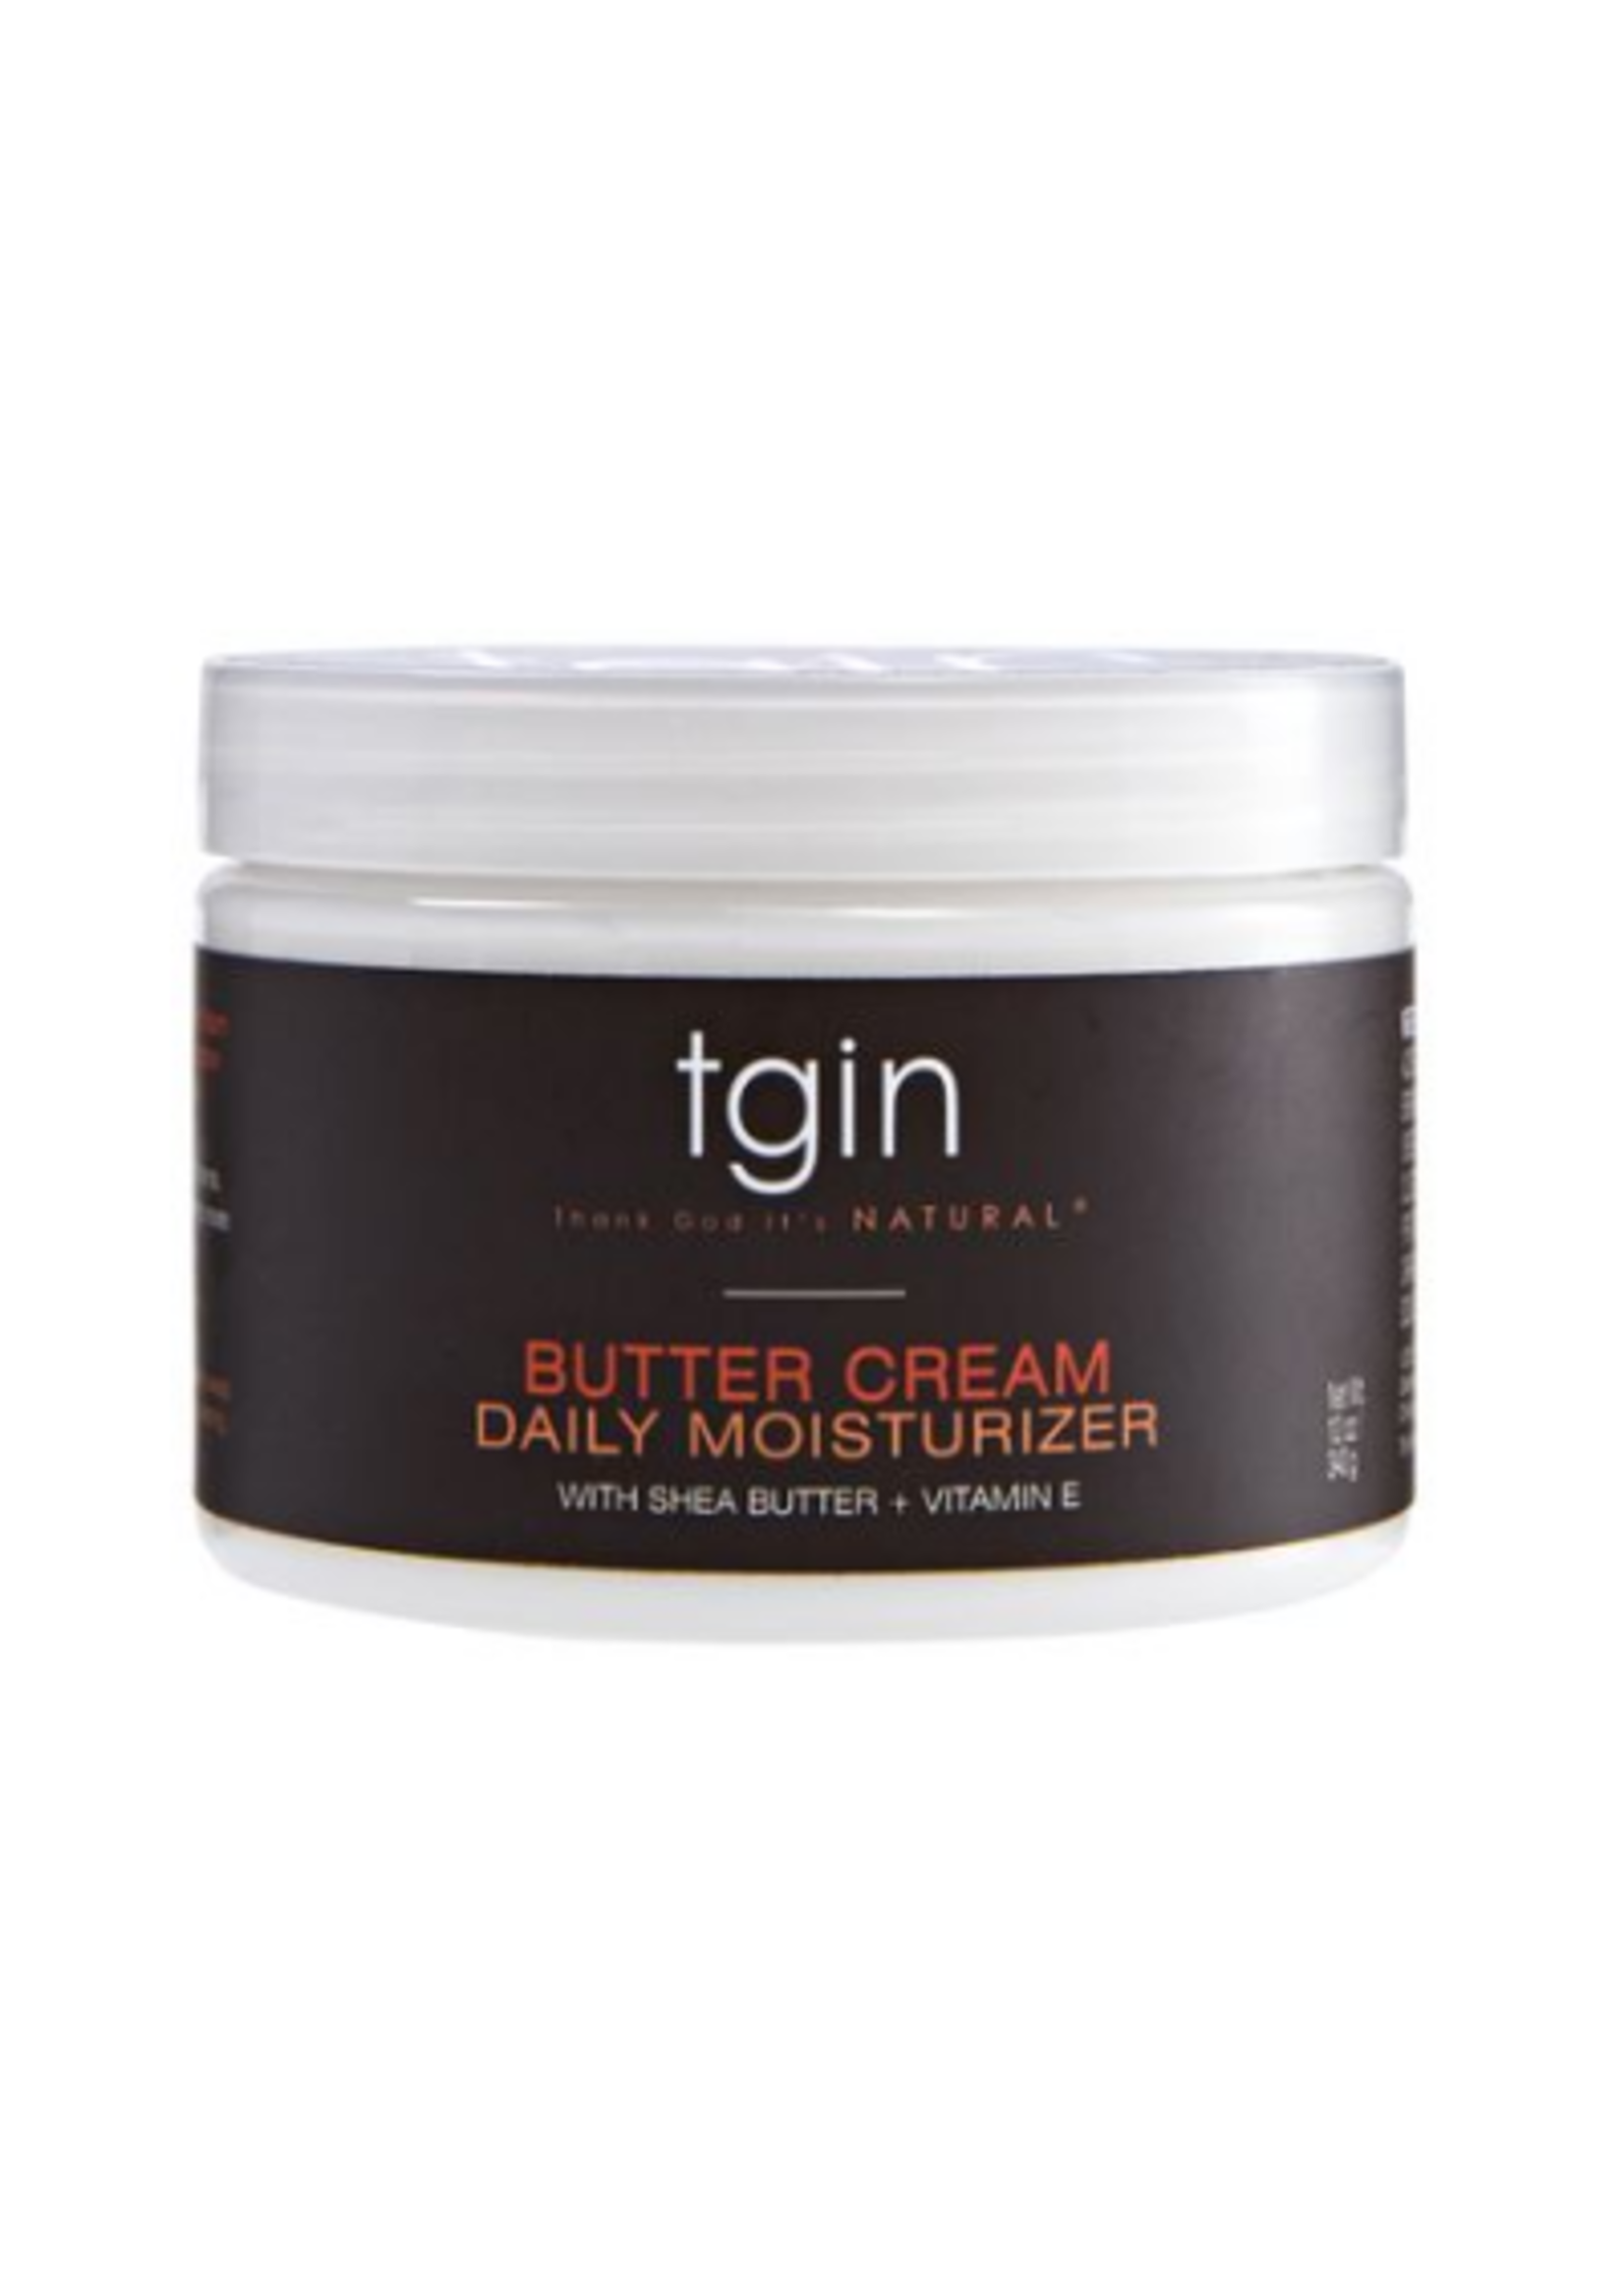 TGIN Butter Cream Moisturizer